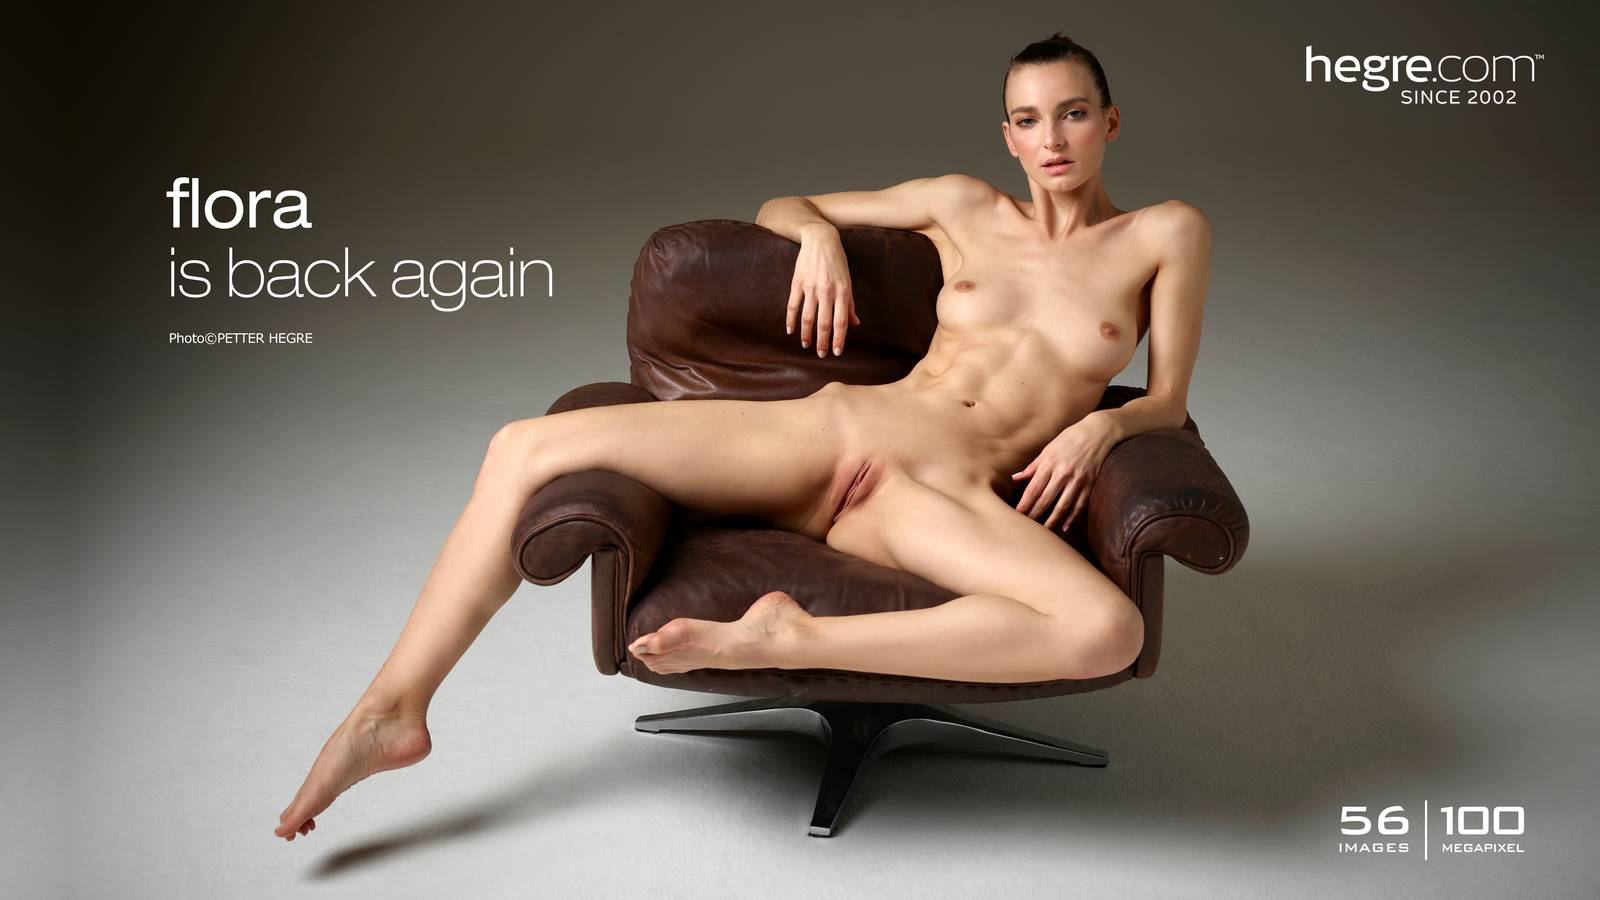 Nude flora hegre anal